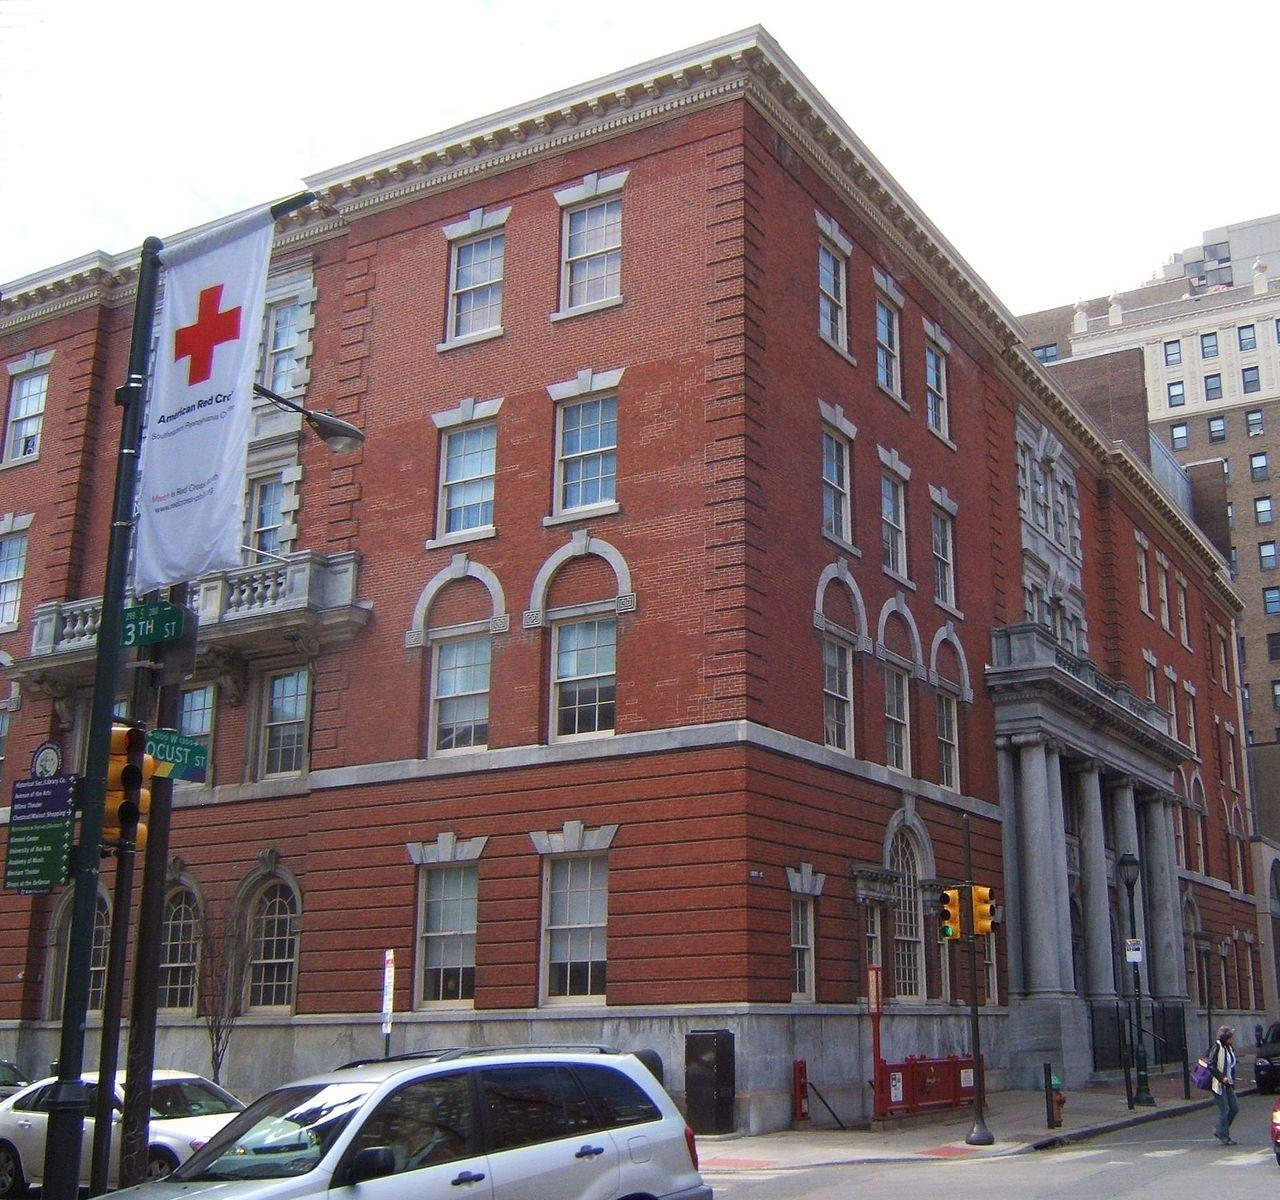 The Historical Society of Pennsylvania